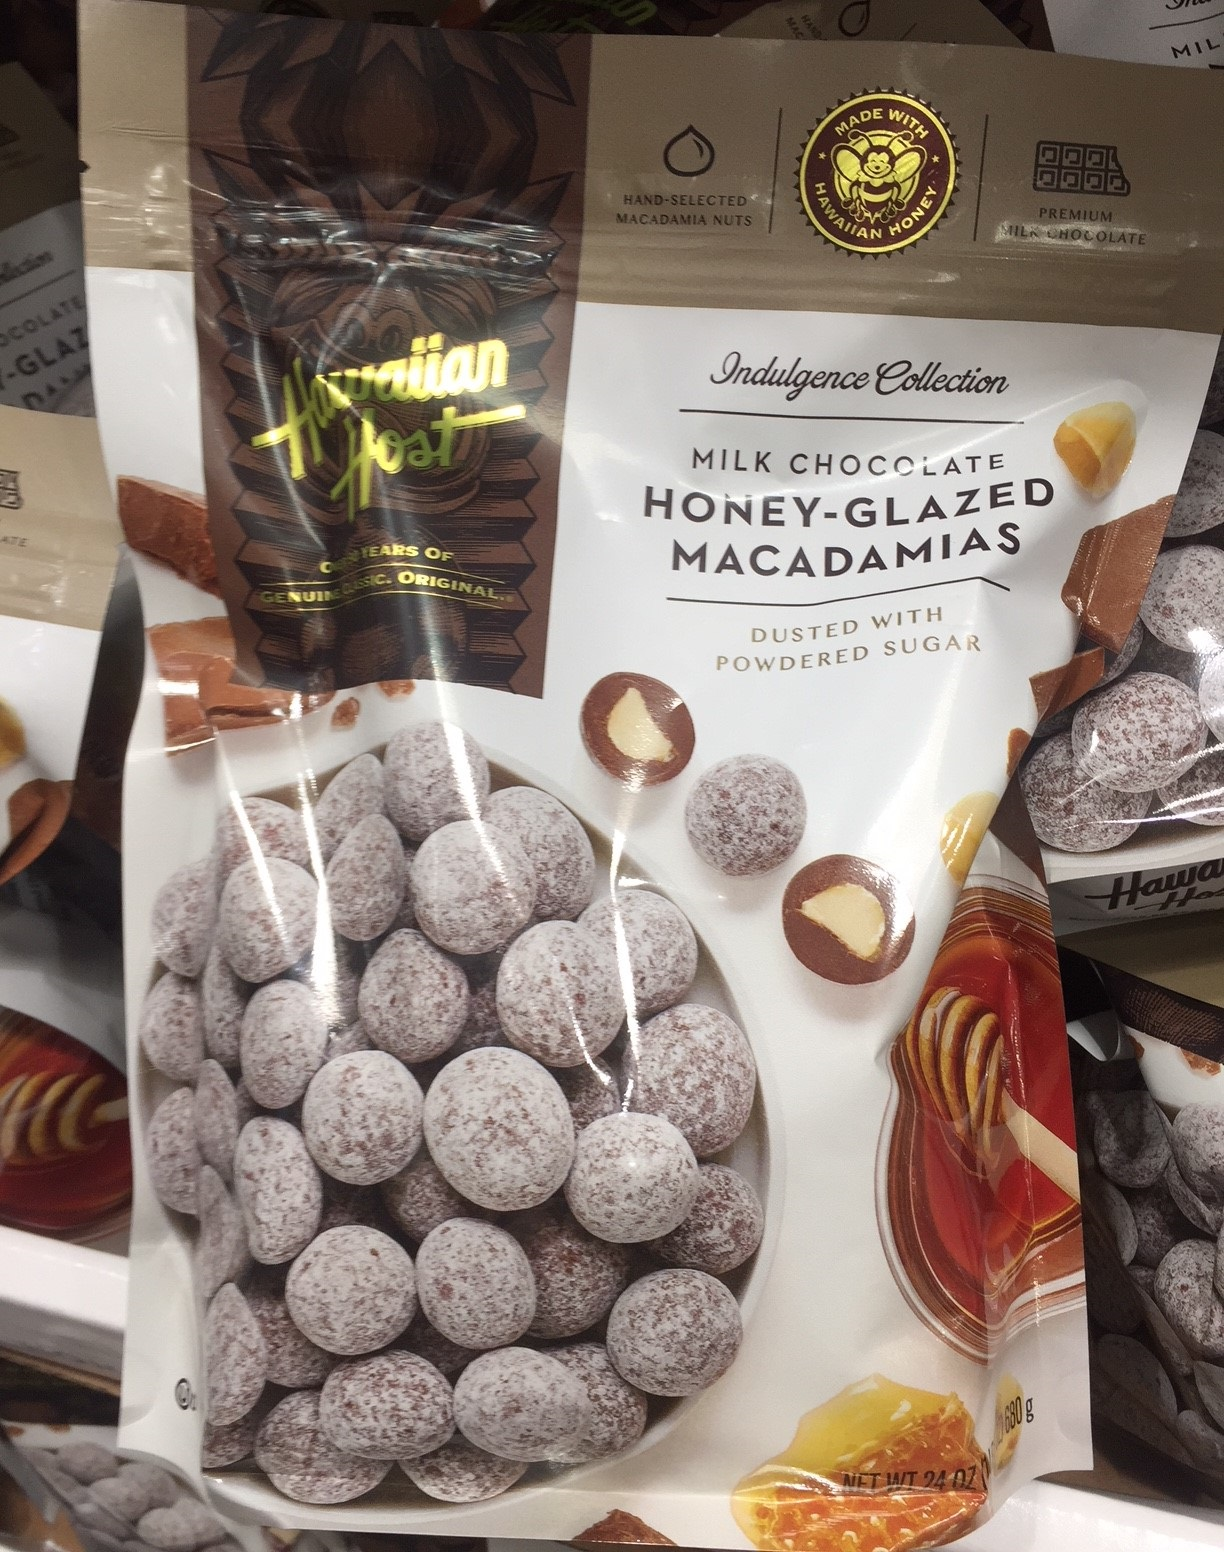 Indulge your sweet tooth with Hawaiian Host Milk Chocolate Honey-Glazed Macadamias